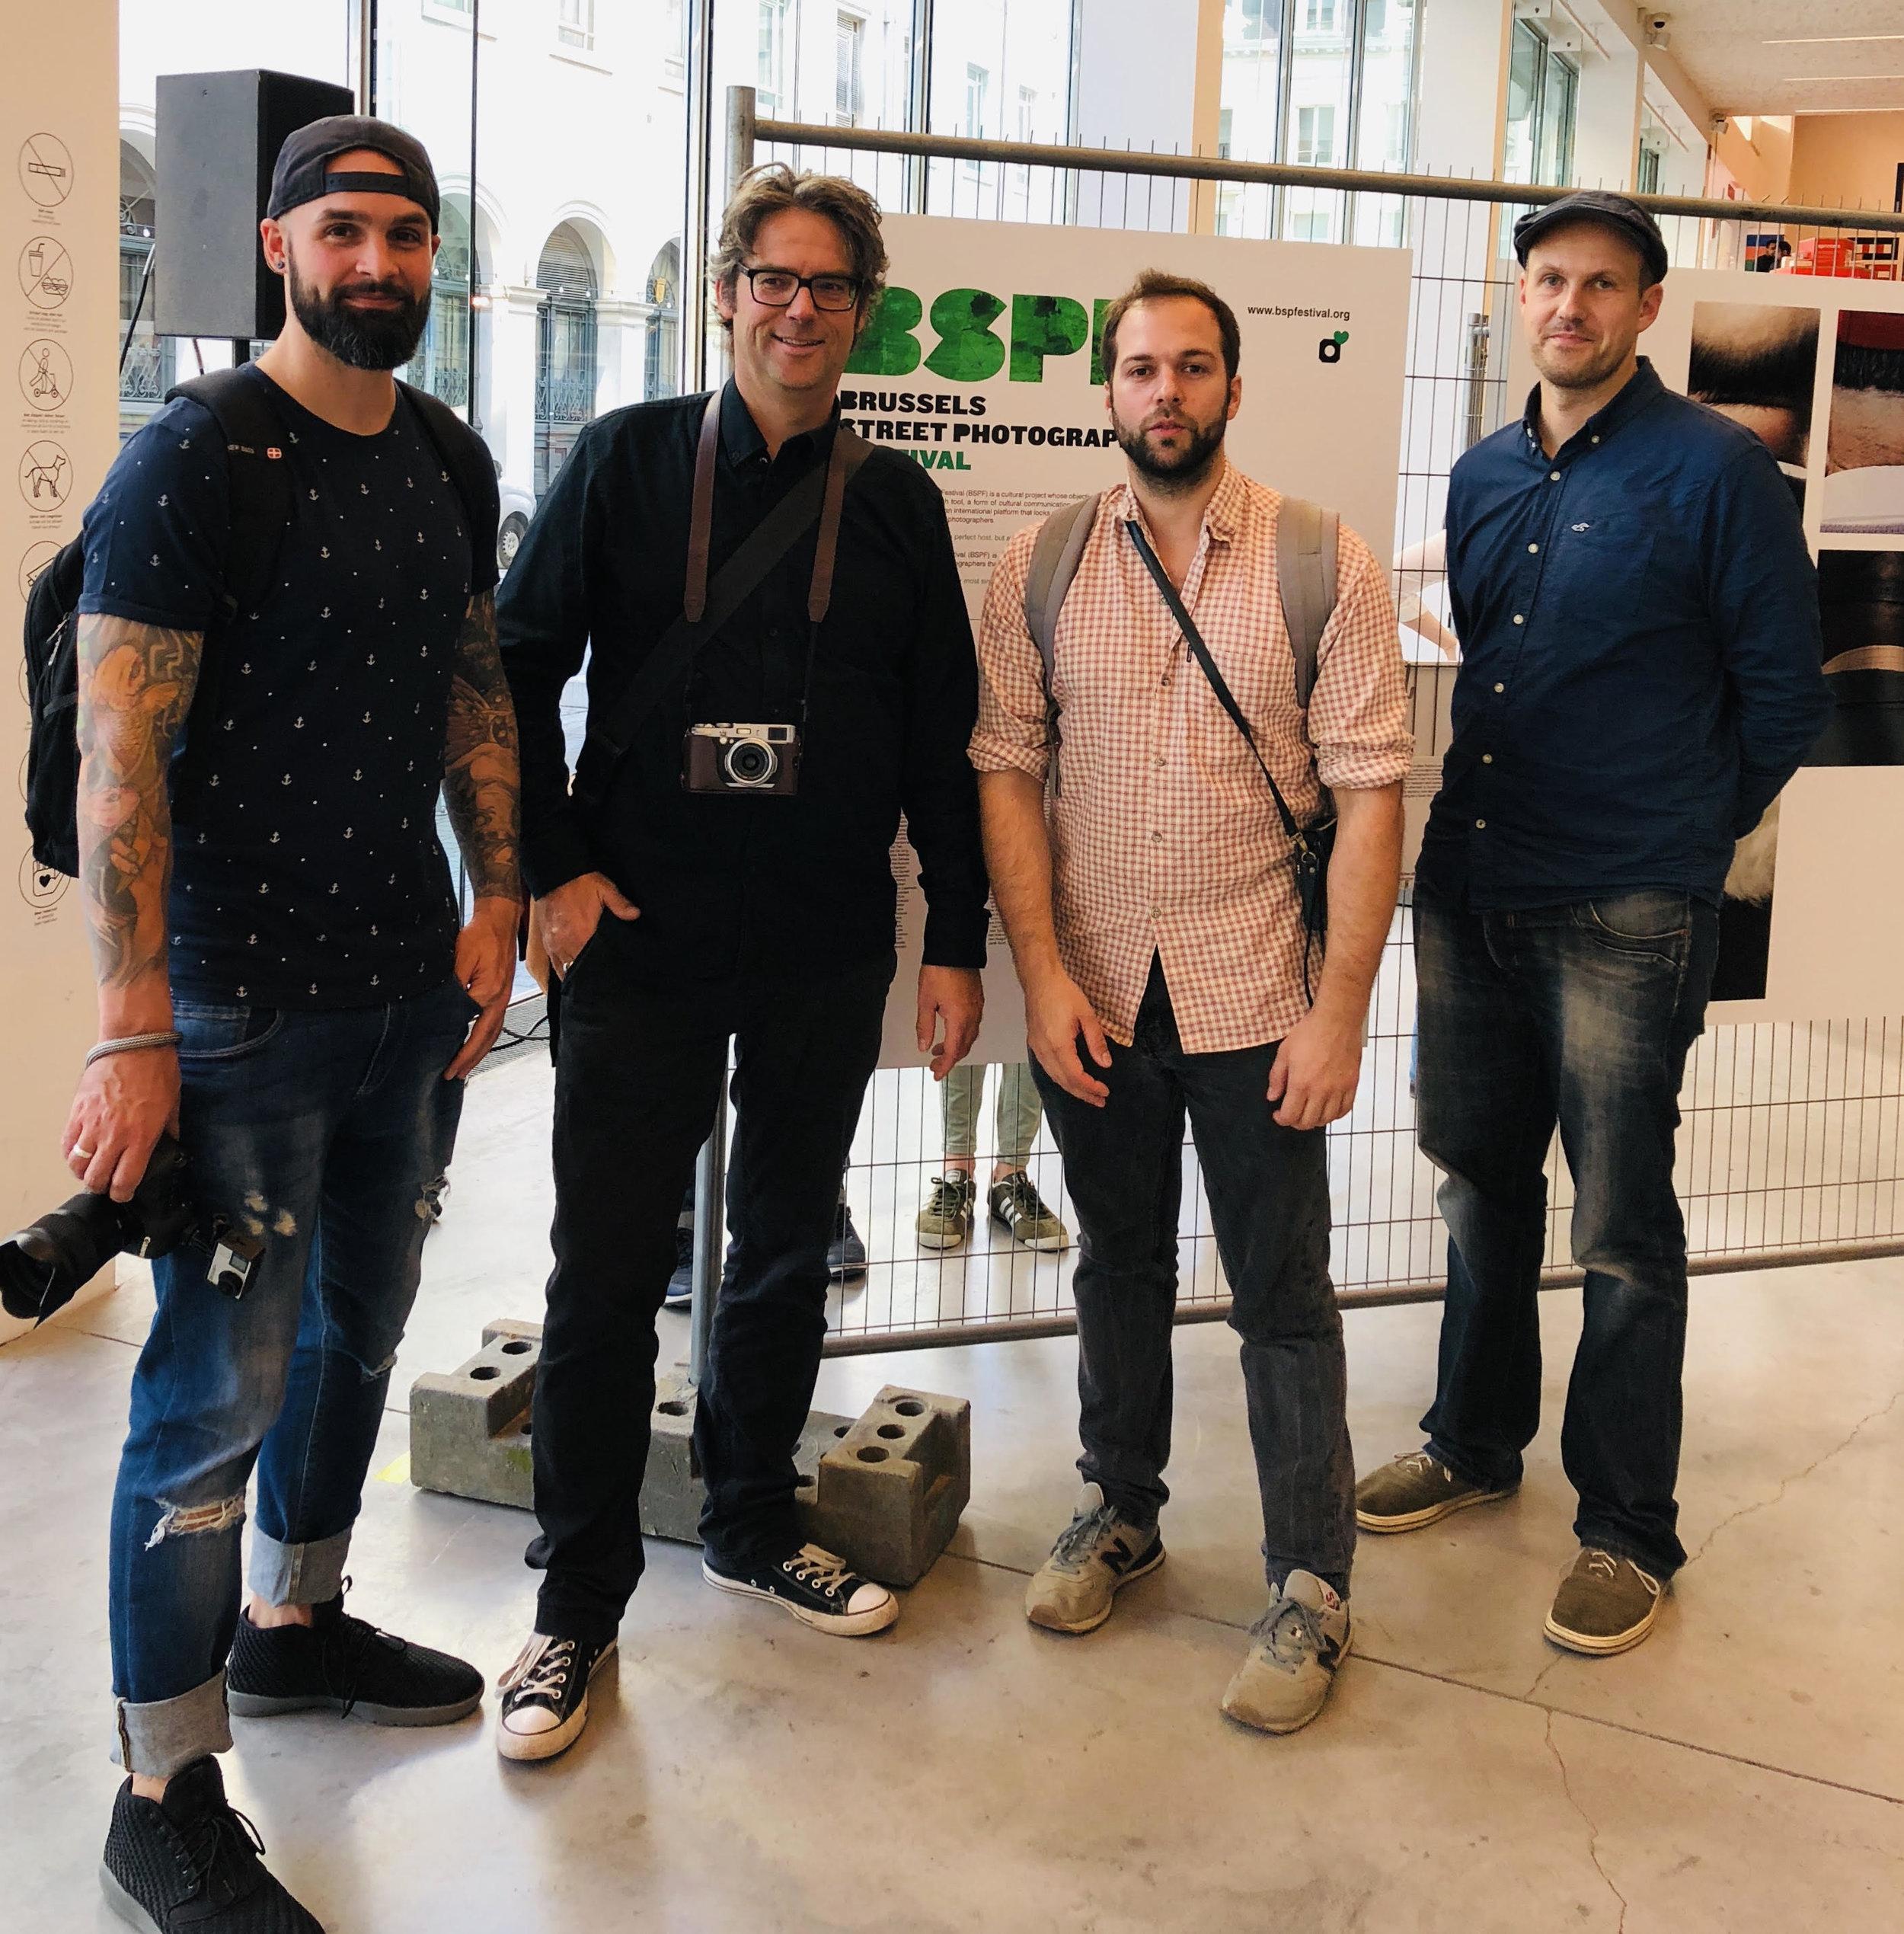 Das SPC-Team in Brüssel: v.lnr. Christopher Reuter, Sven Hoffmann, David Skokouhbeen, Andreas Ott.